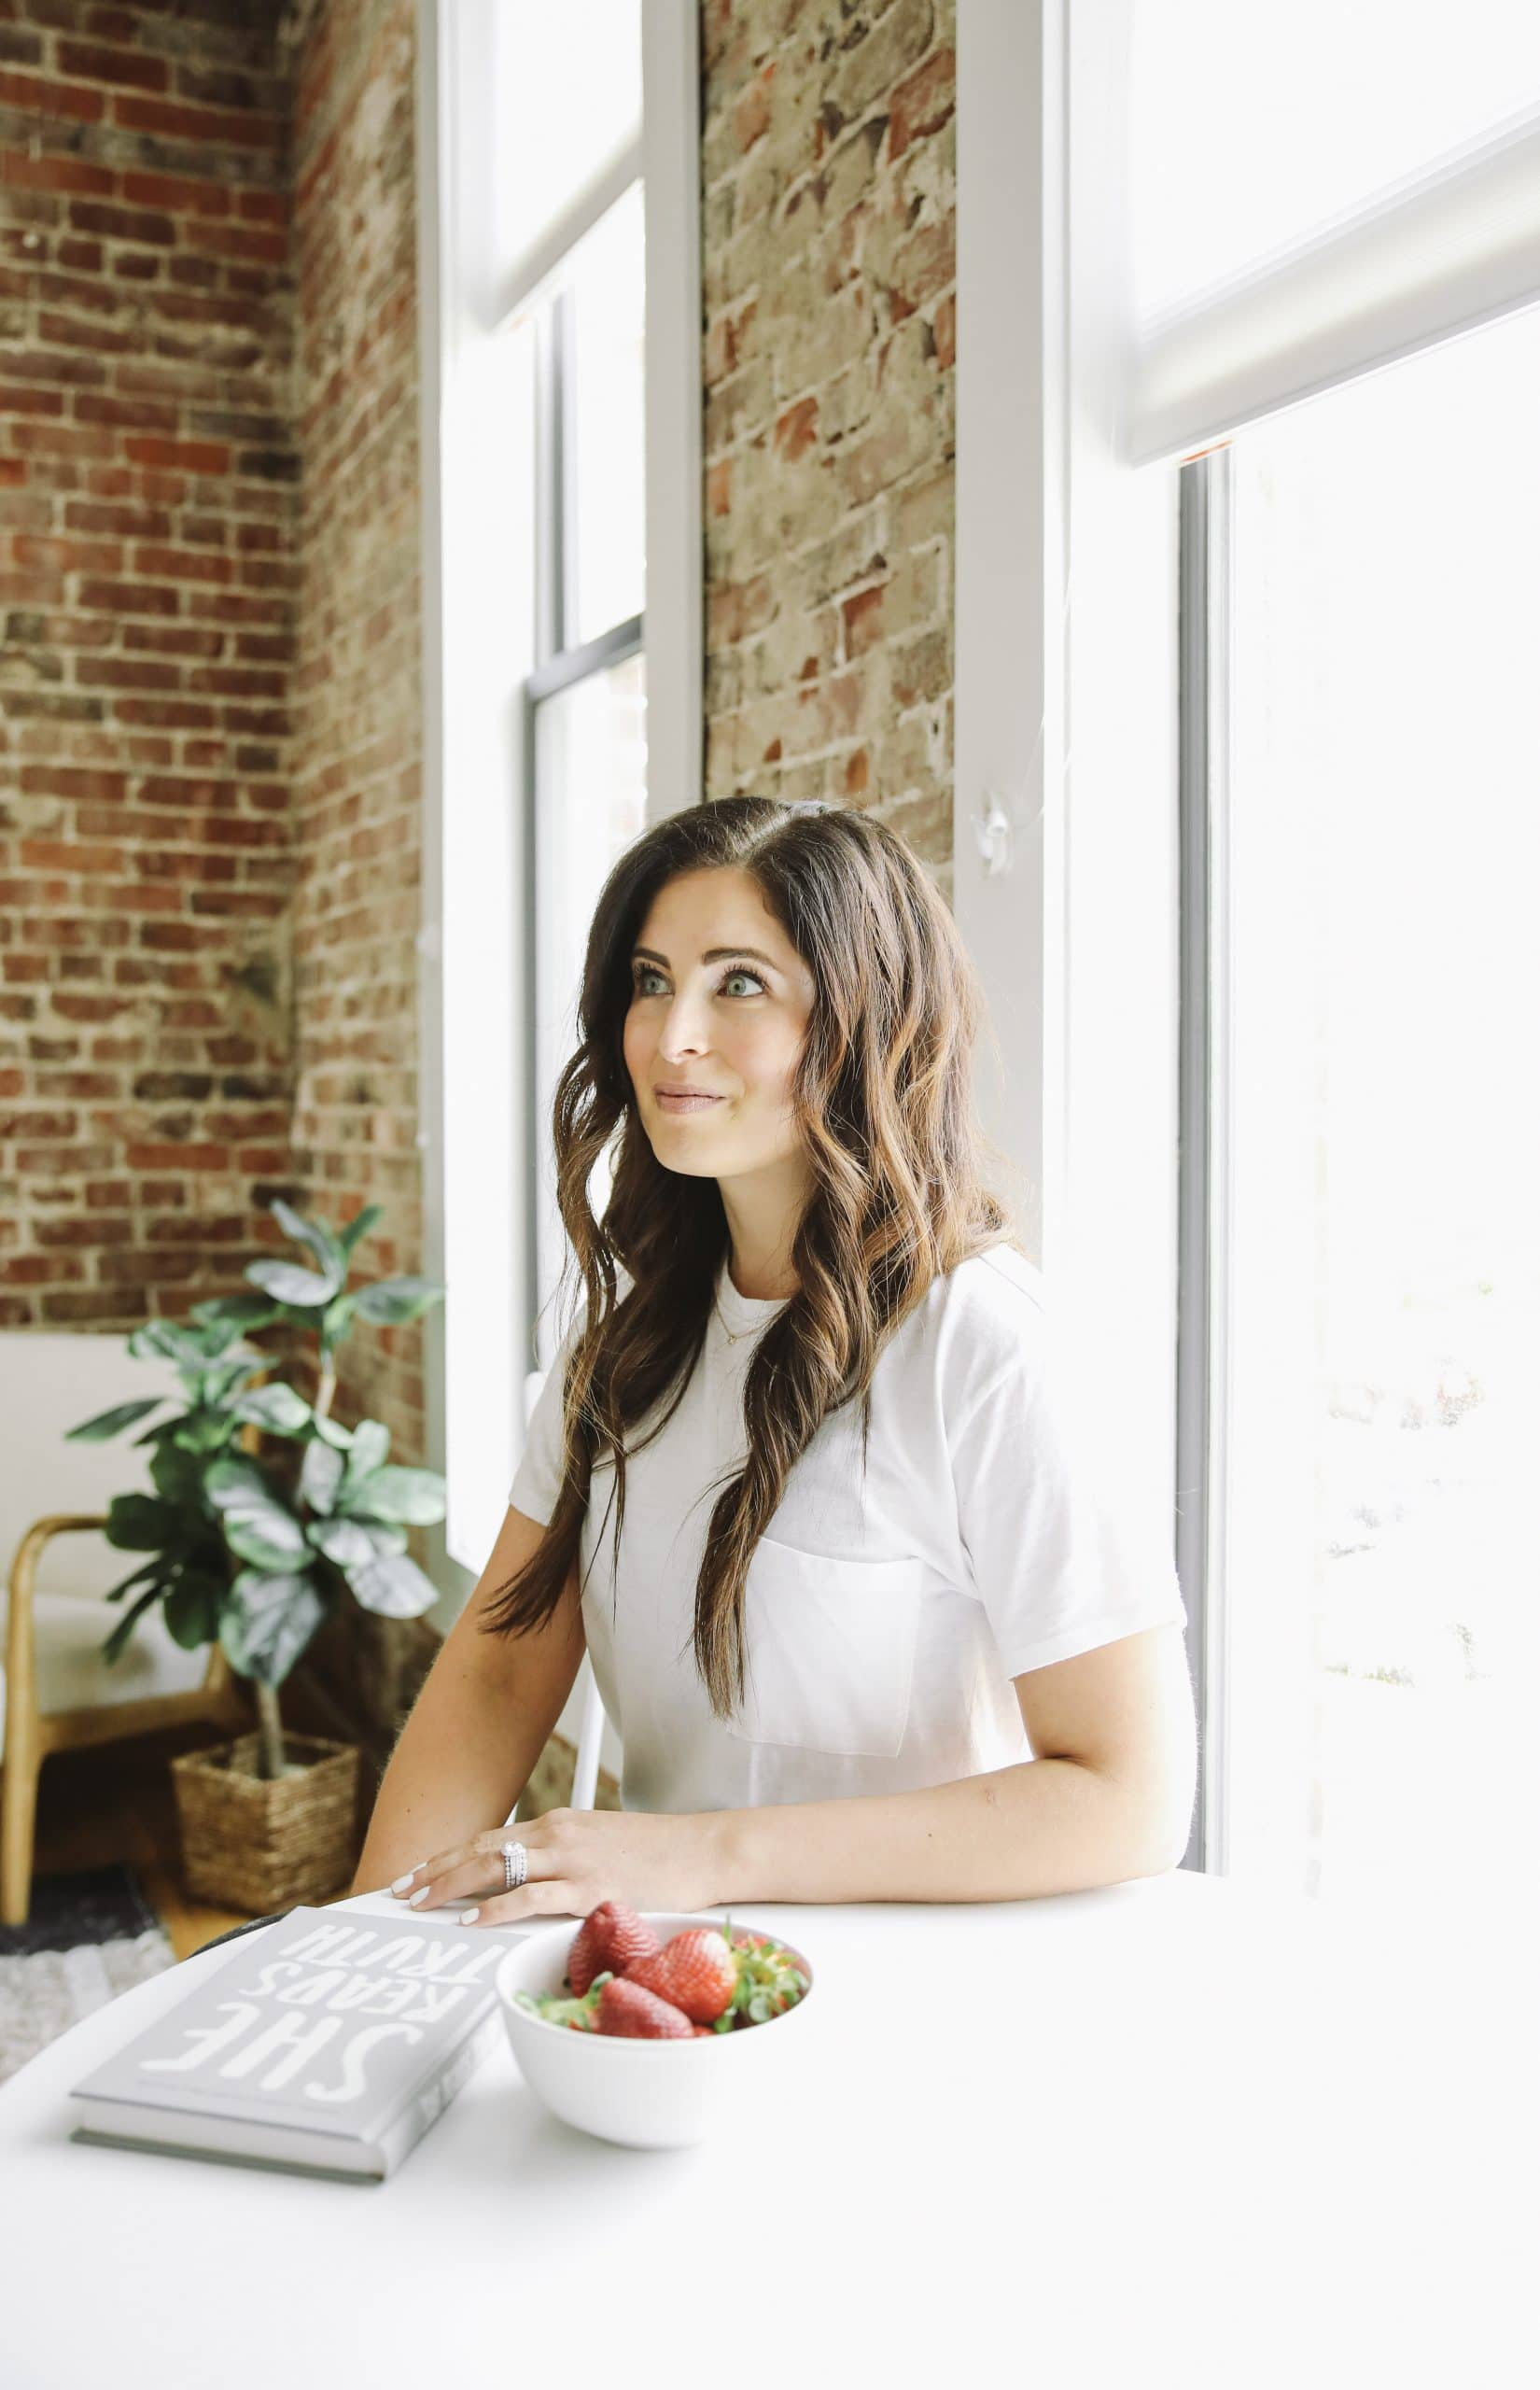 Image of Sarah Bridgeman